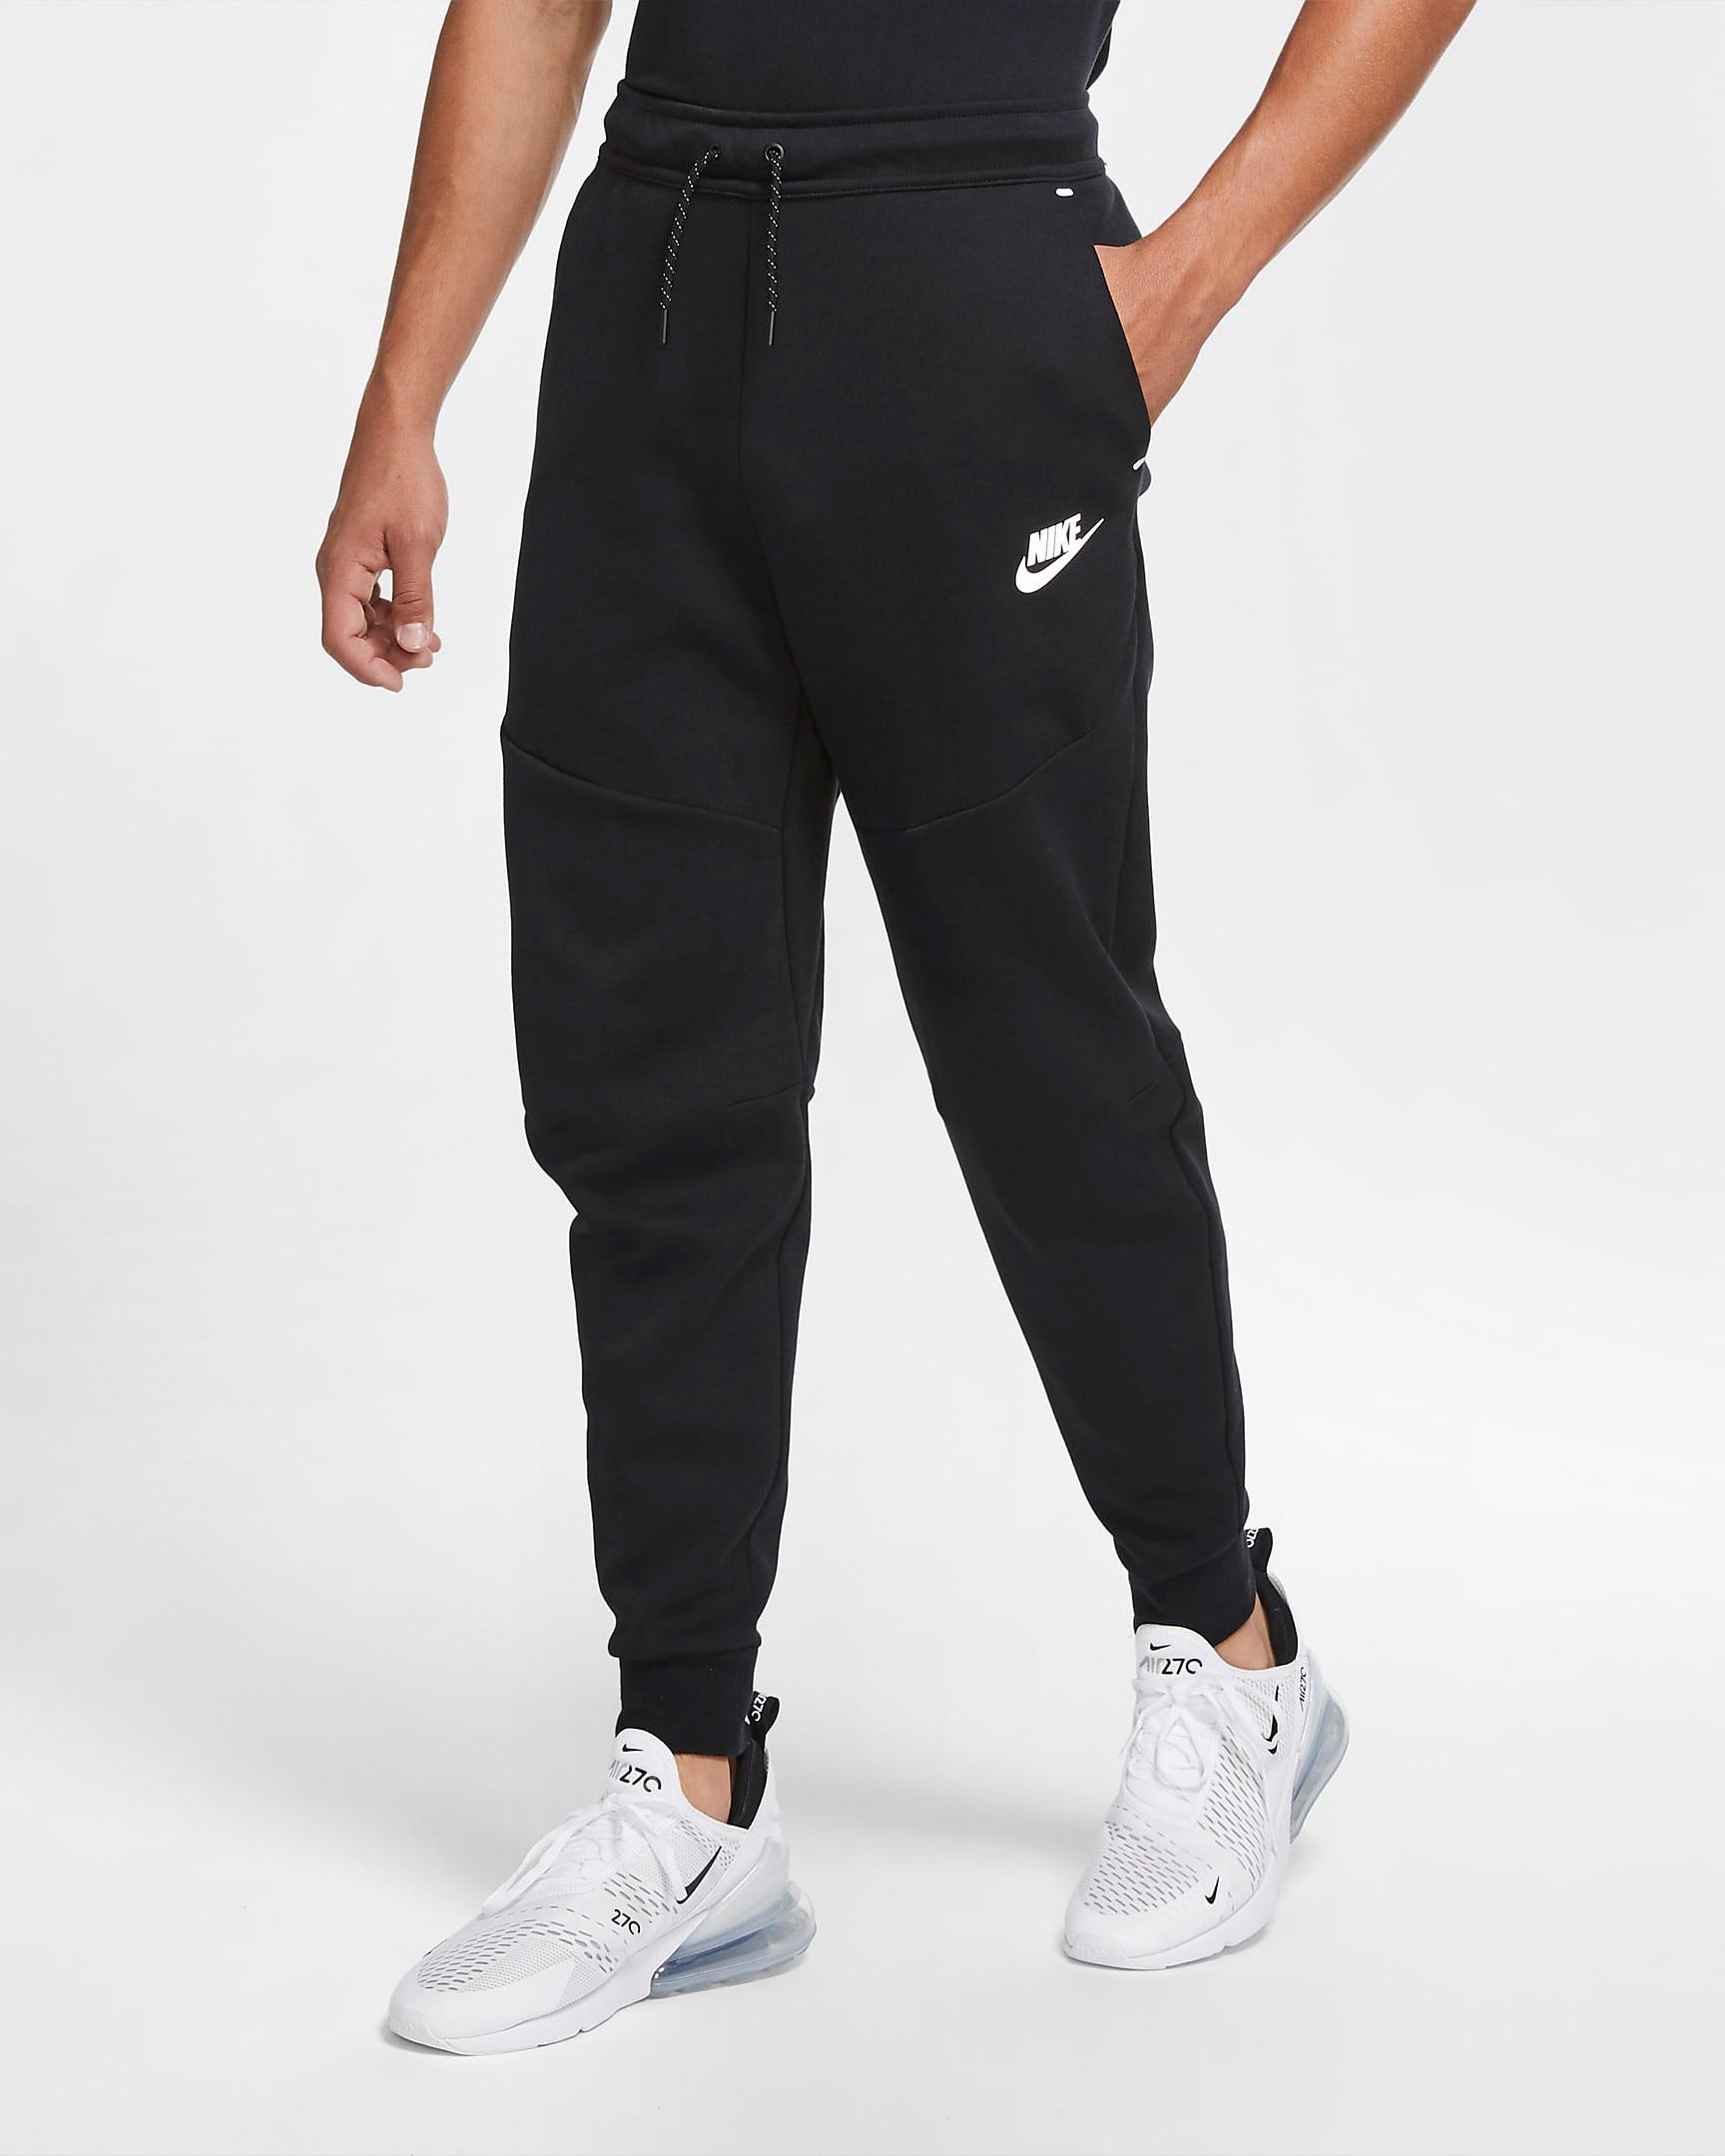 nike-adapt-auto-max-triple-black-jogger-pants-1